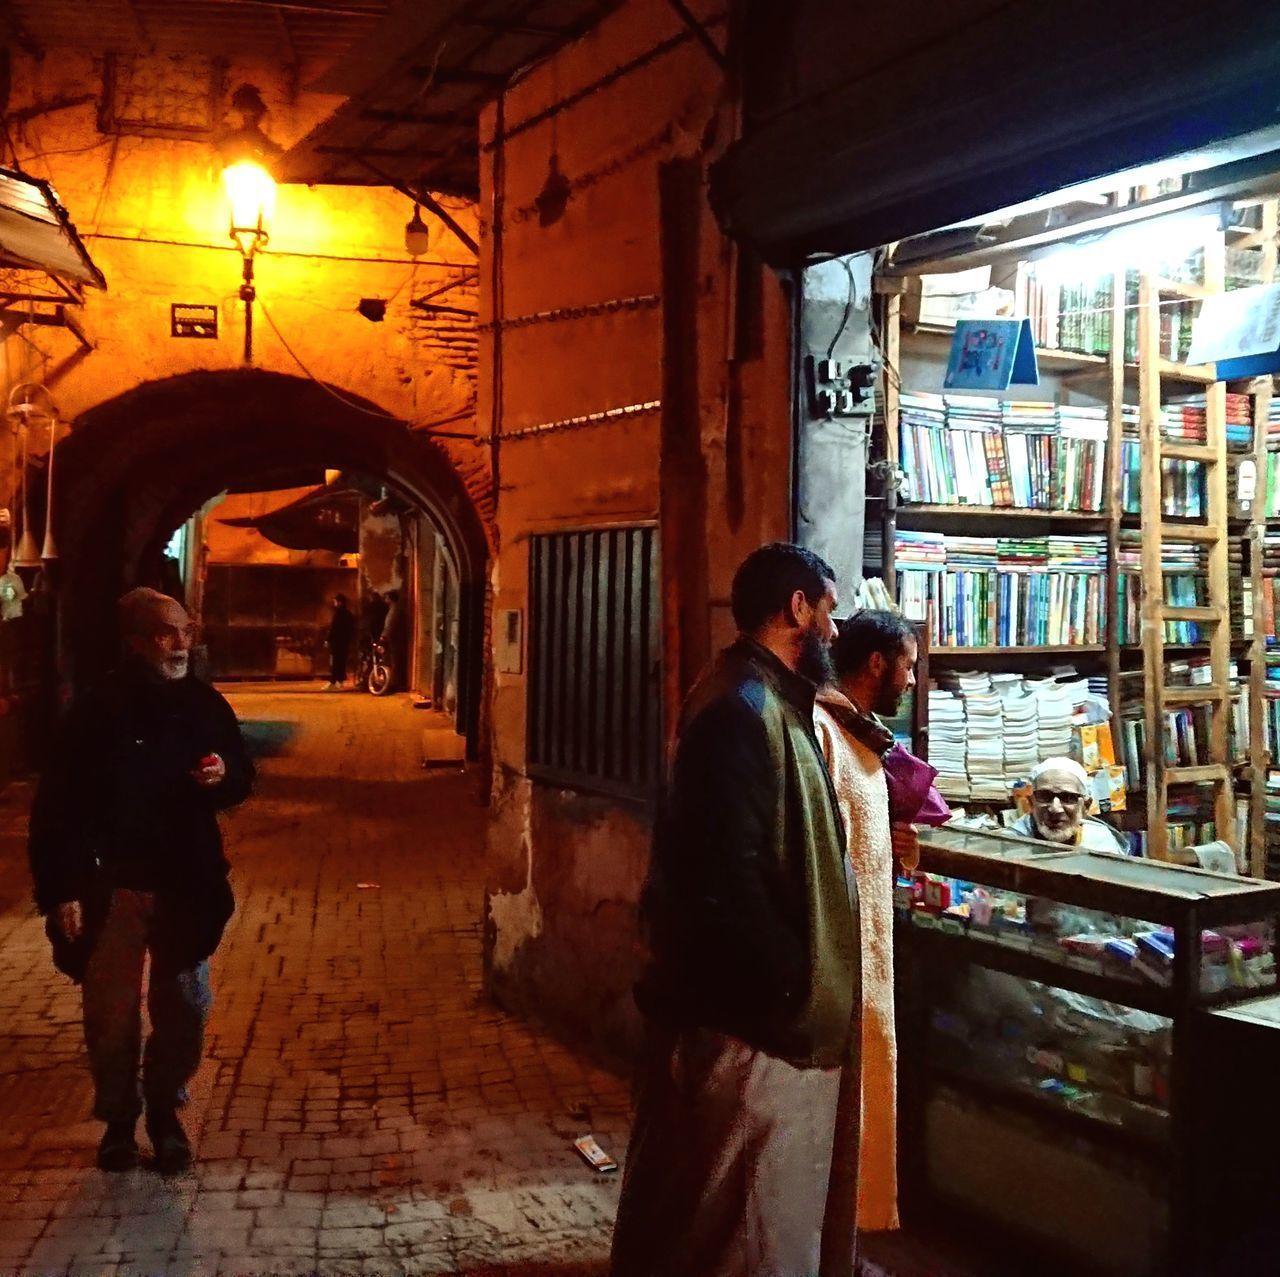 FULL LENGTH OF MAN STANDING ON STREET IN ILLUMINATED CITY